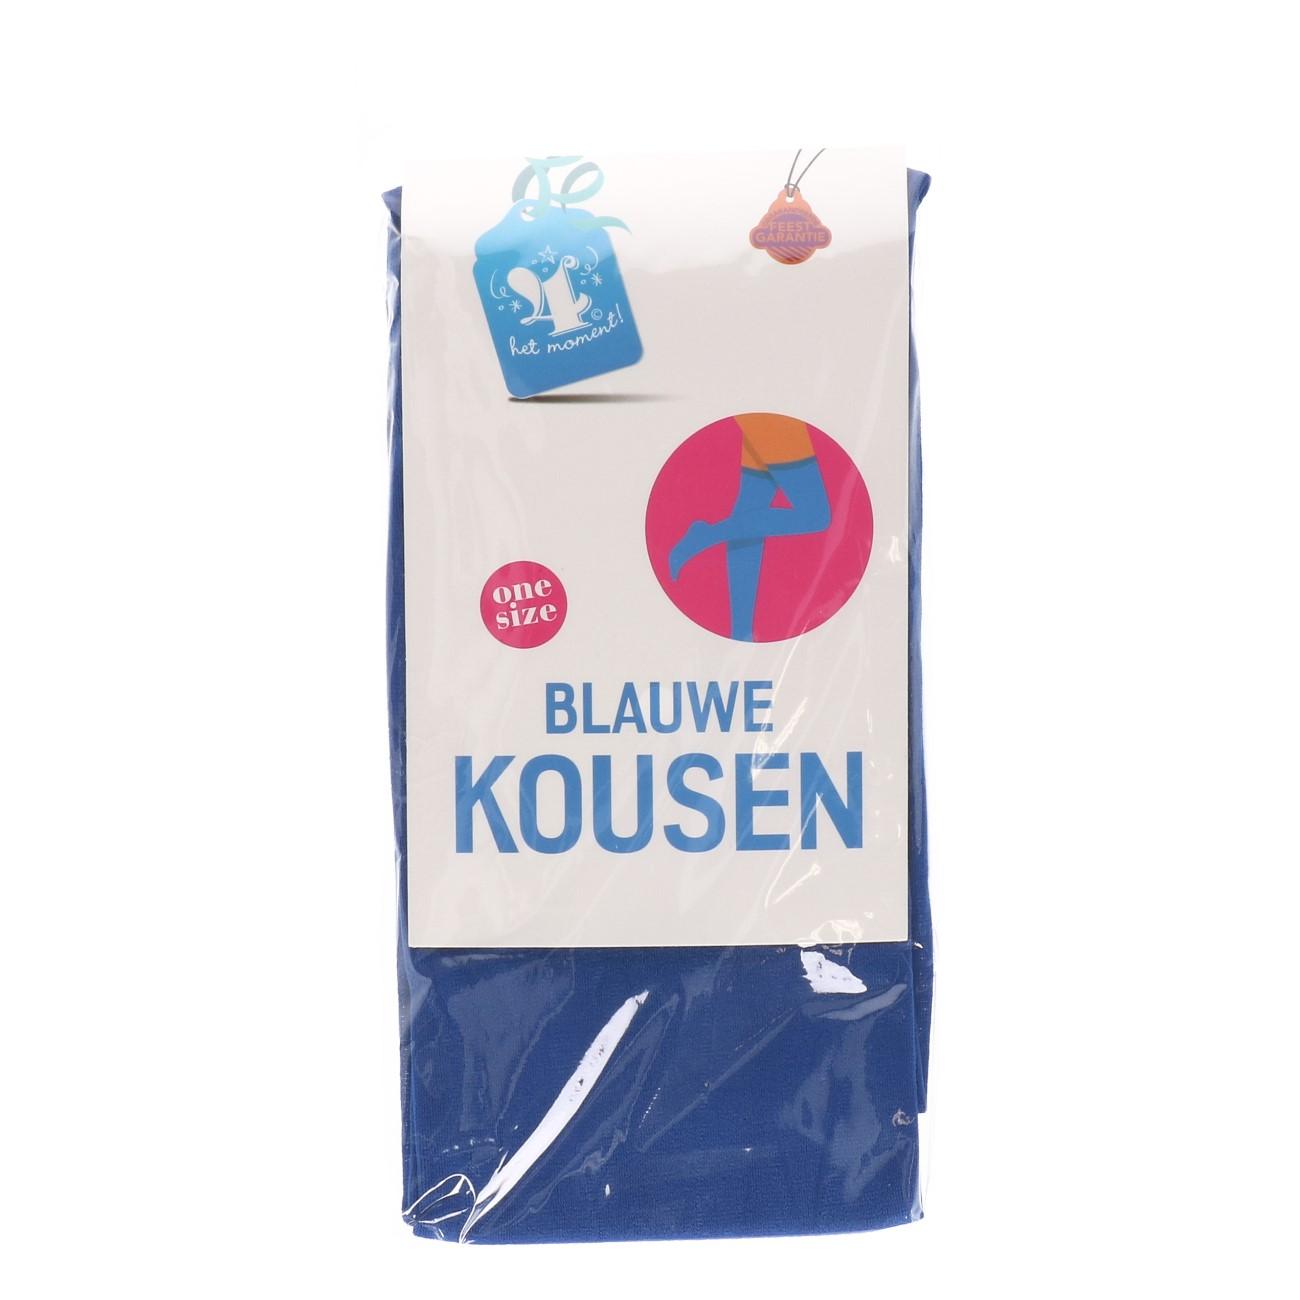 Kousen blauwe one size